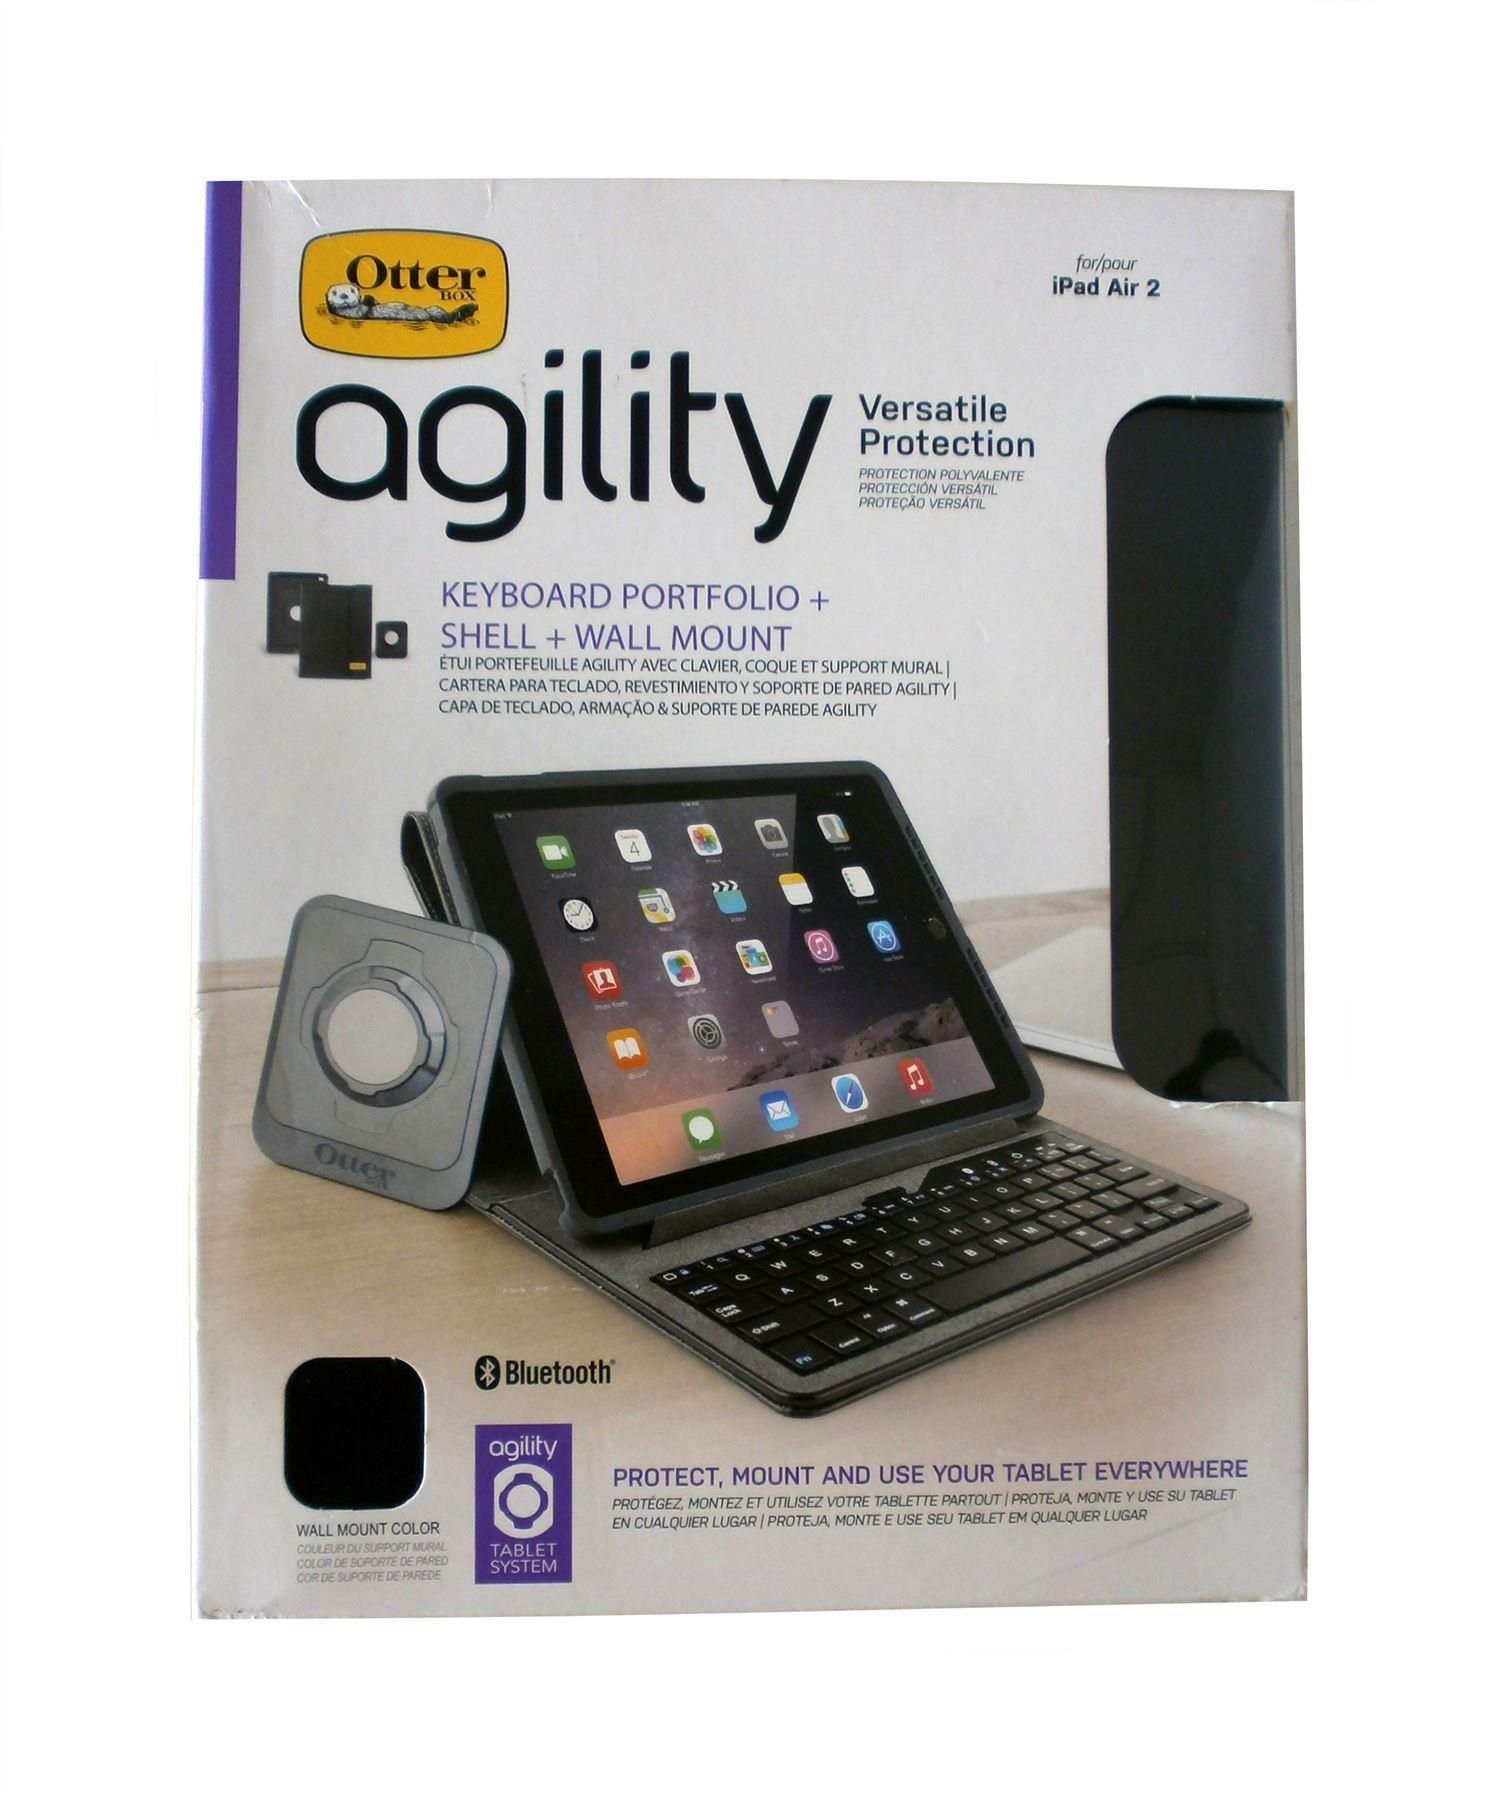 Otterbox Agility Keyboard Portfolio Case Amp Wall Mount